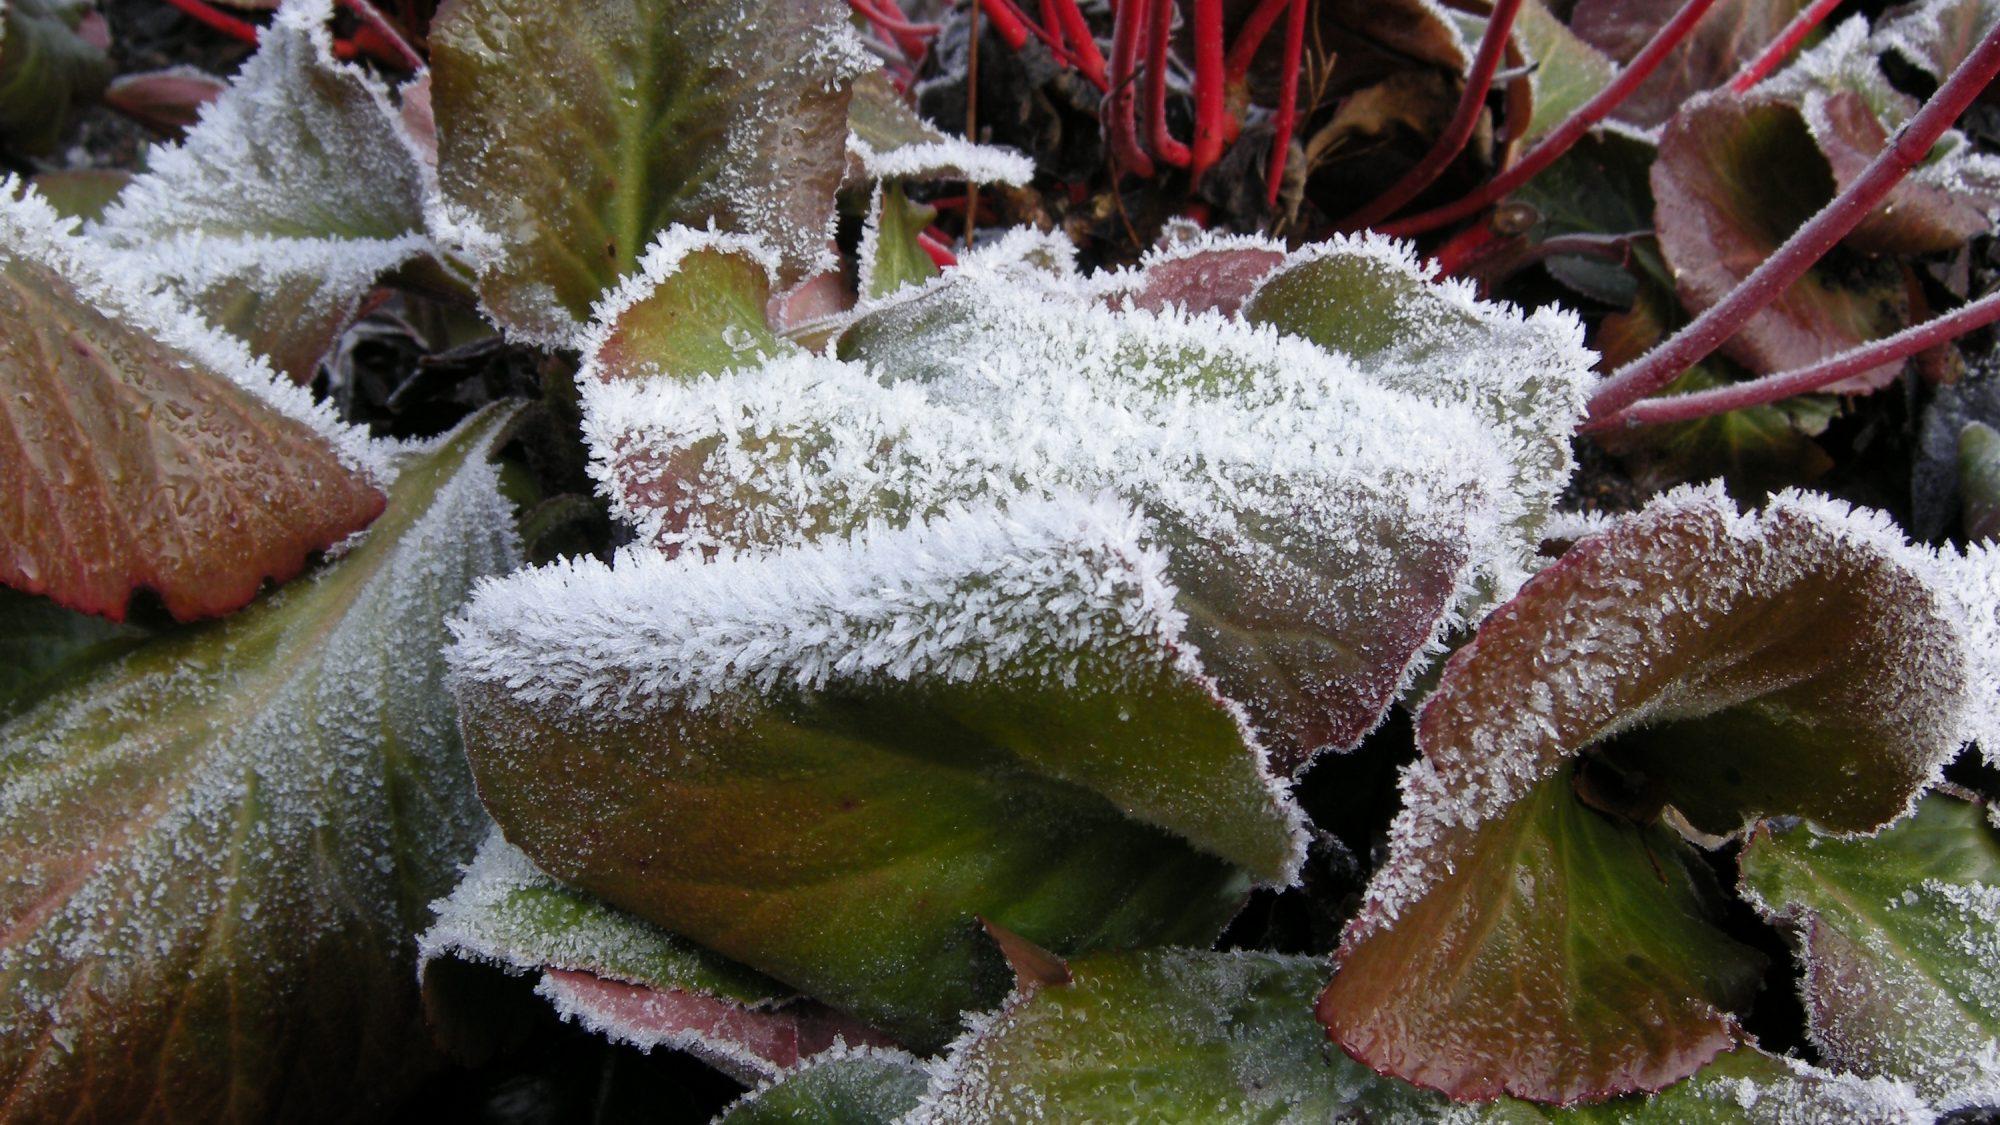 'Cornus alba 'Sibirica' underplanted with Bergenia 'Bressingham Rubyn' in the Winter garden on a frosty day.